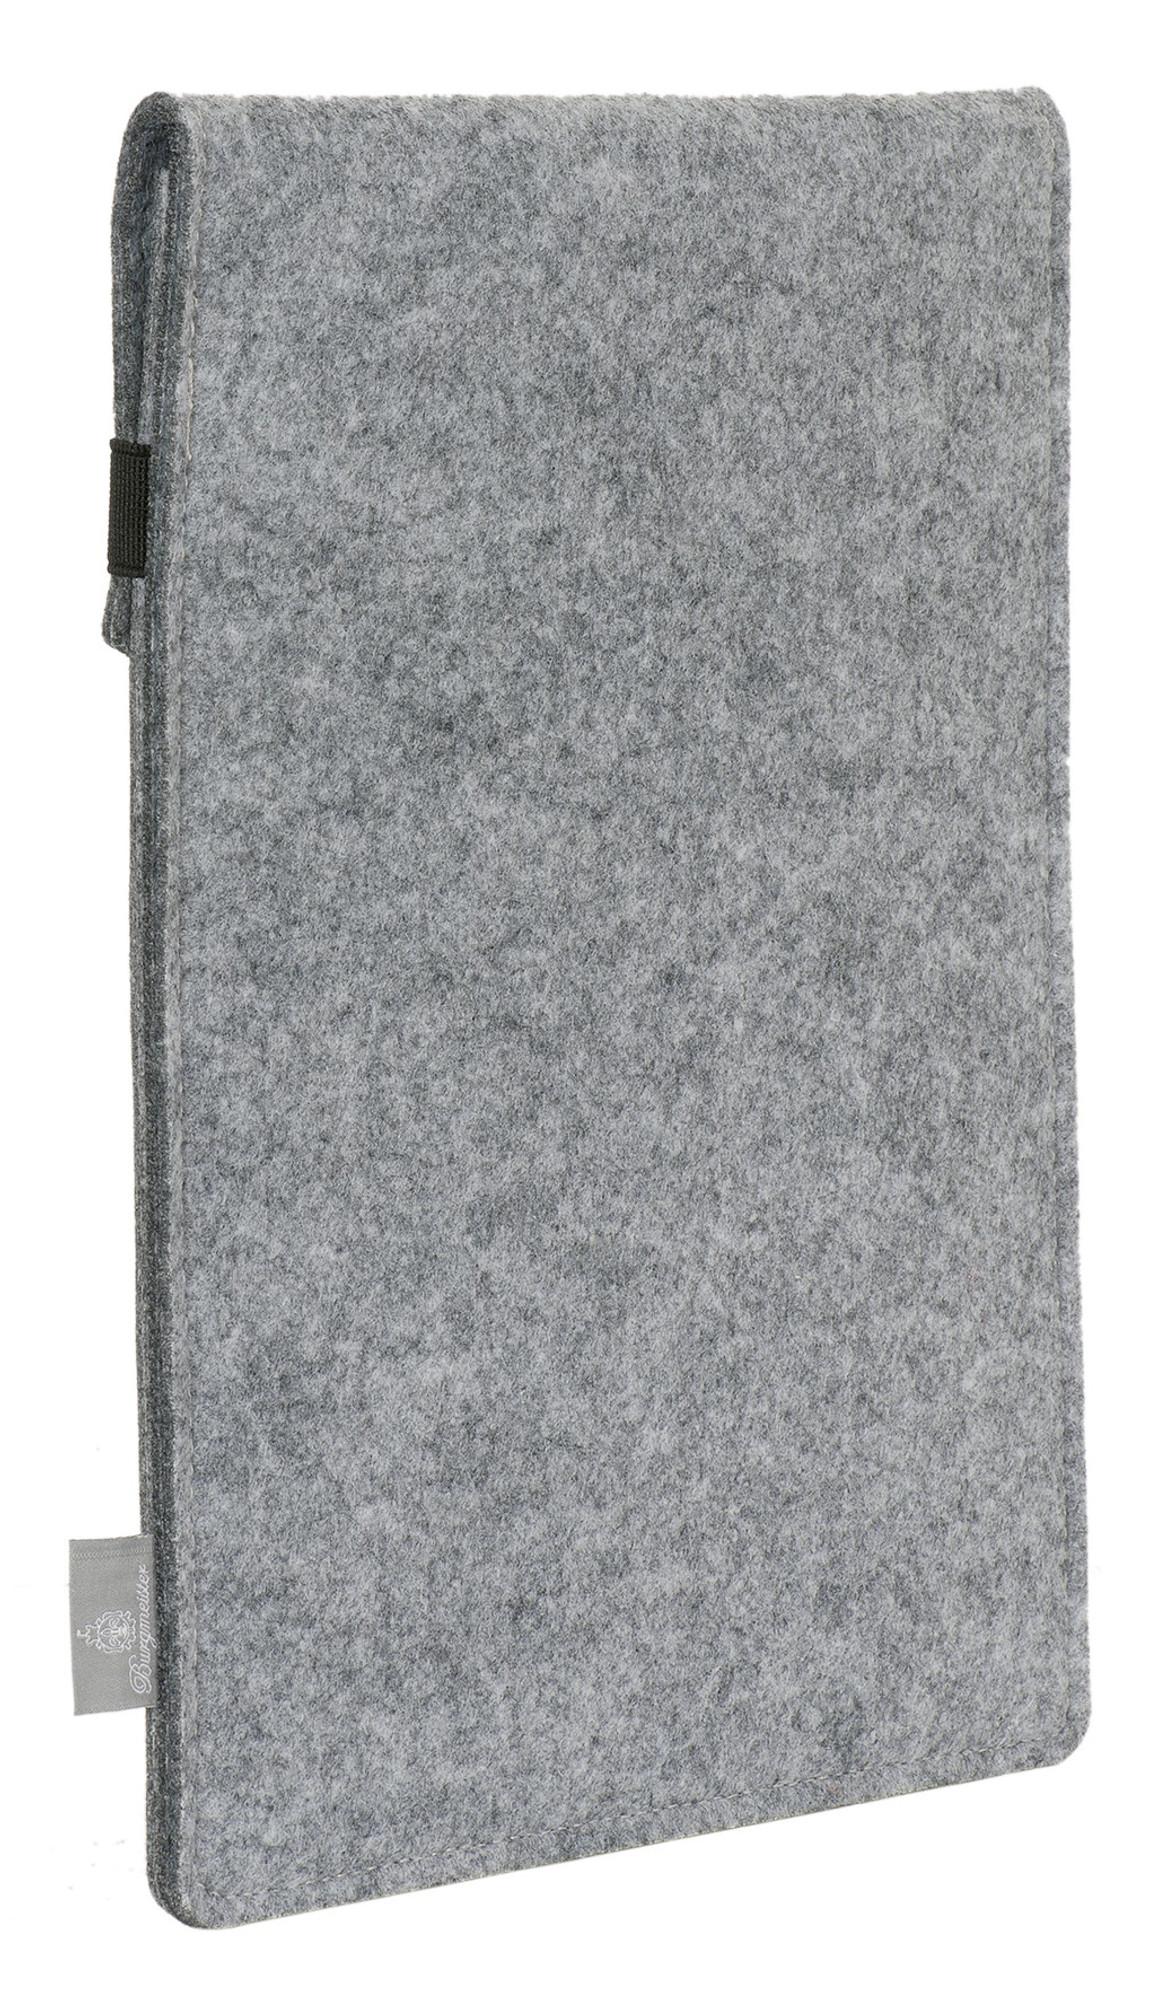 burgmeister damen herren ipad tablet pc tasche filz hbm3019 164 taschen. Black Bedroom Furniture Sets. Home Design Ideas